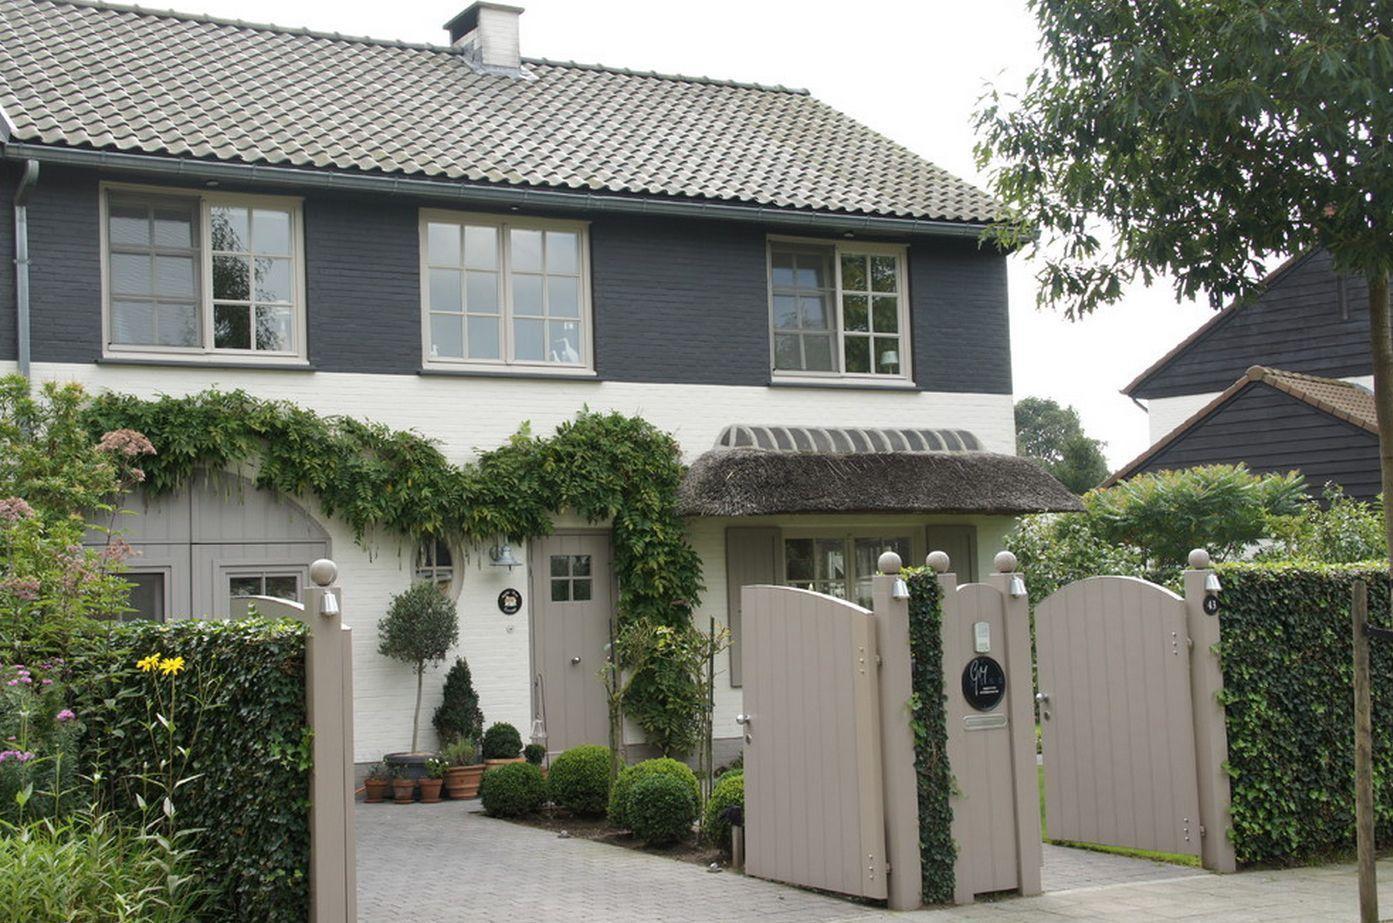 Fachadas de casas 60 fotos incr veis para te inspirar - Maison originale bagnato architecte ...